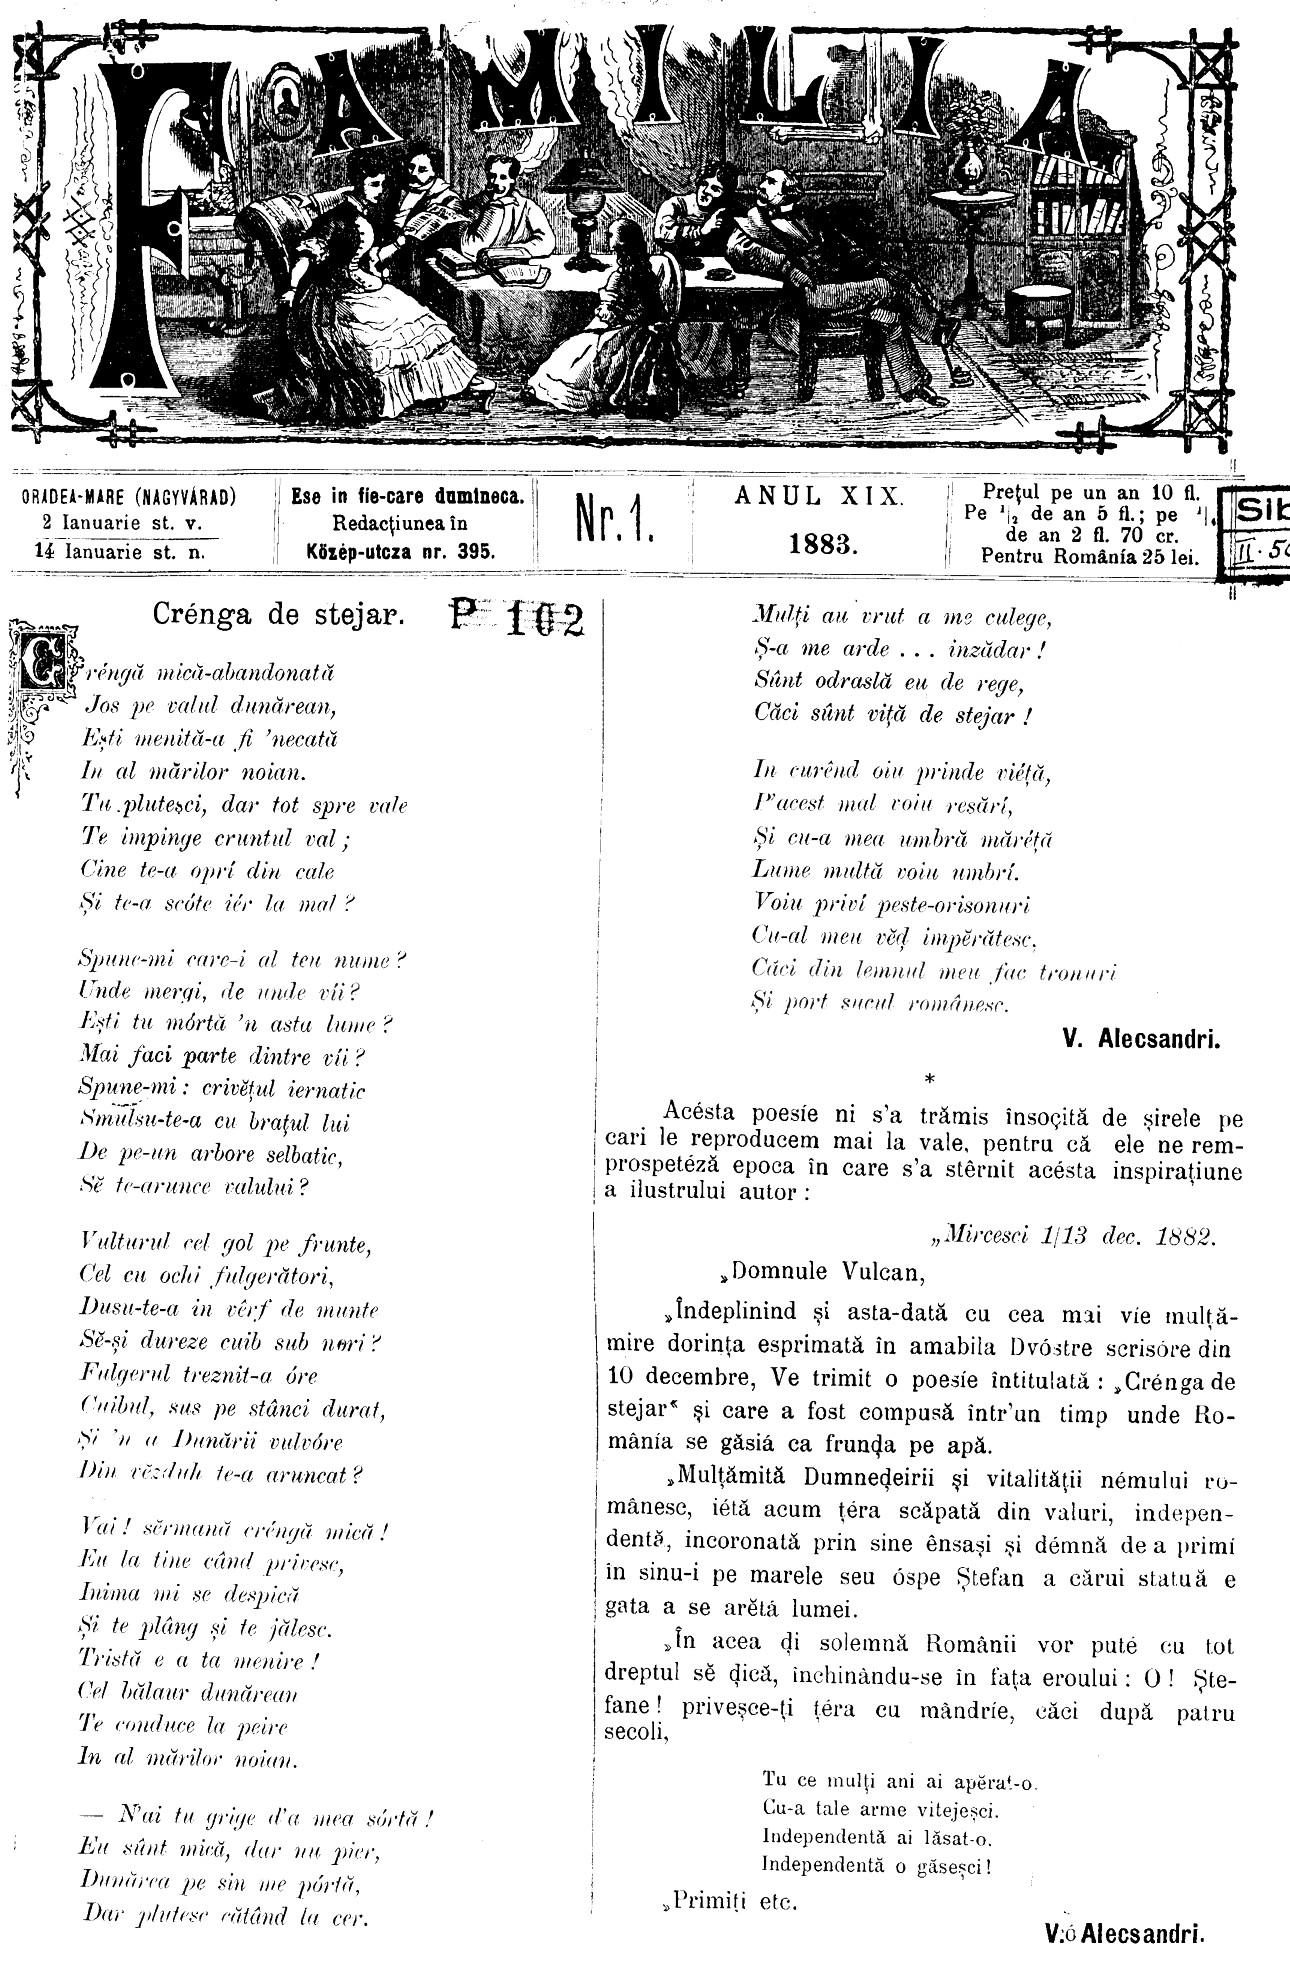 Alecsandri 1883_019_1-5